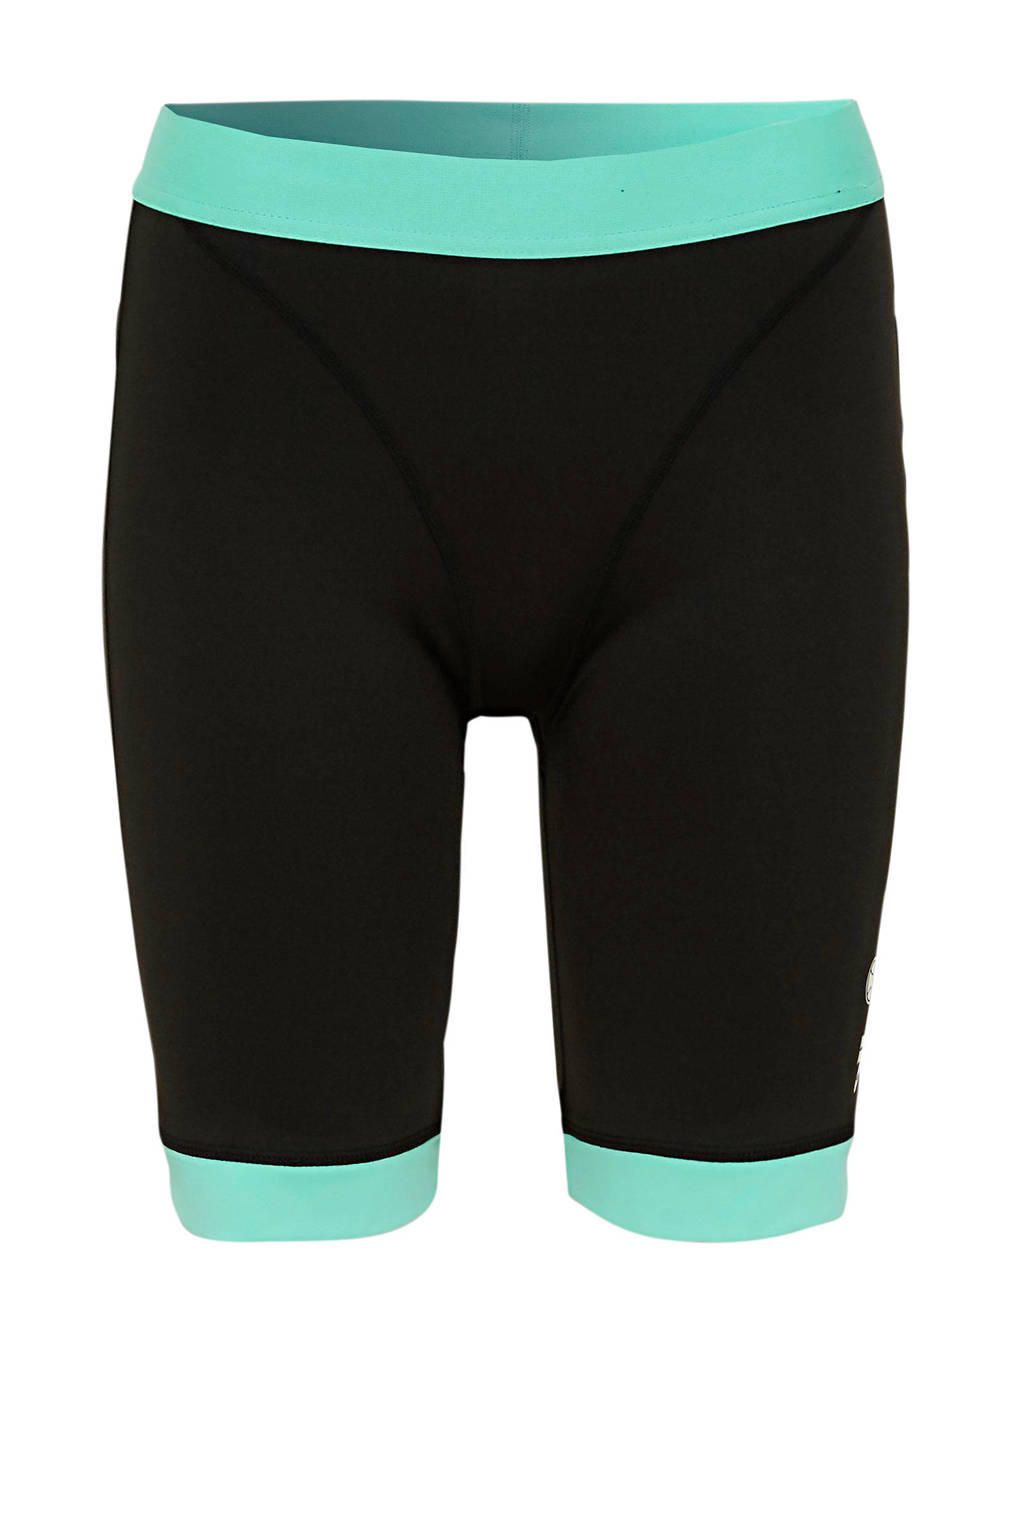 Ellesse cycling short zwart/aquablauw, Zwart/Aquablauw